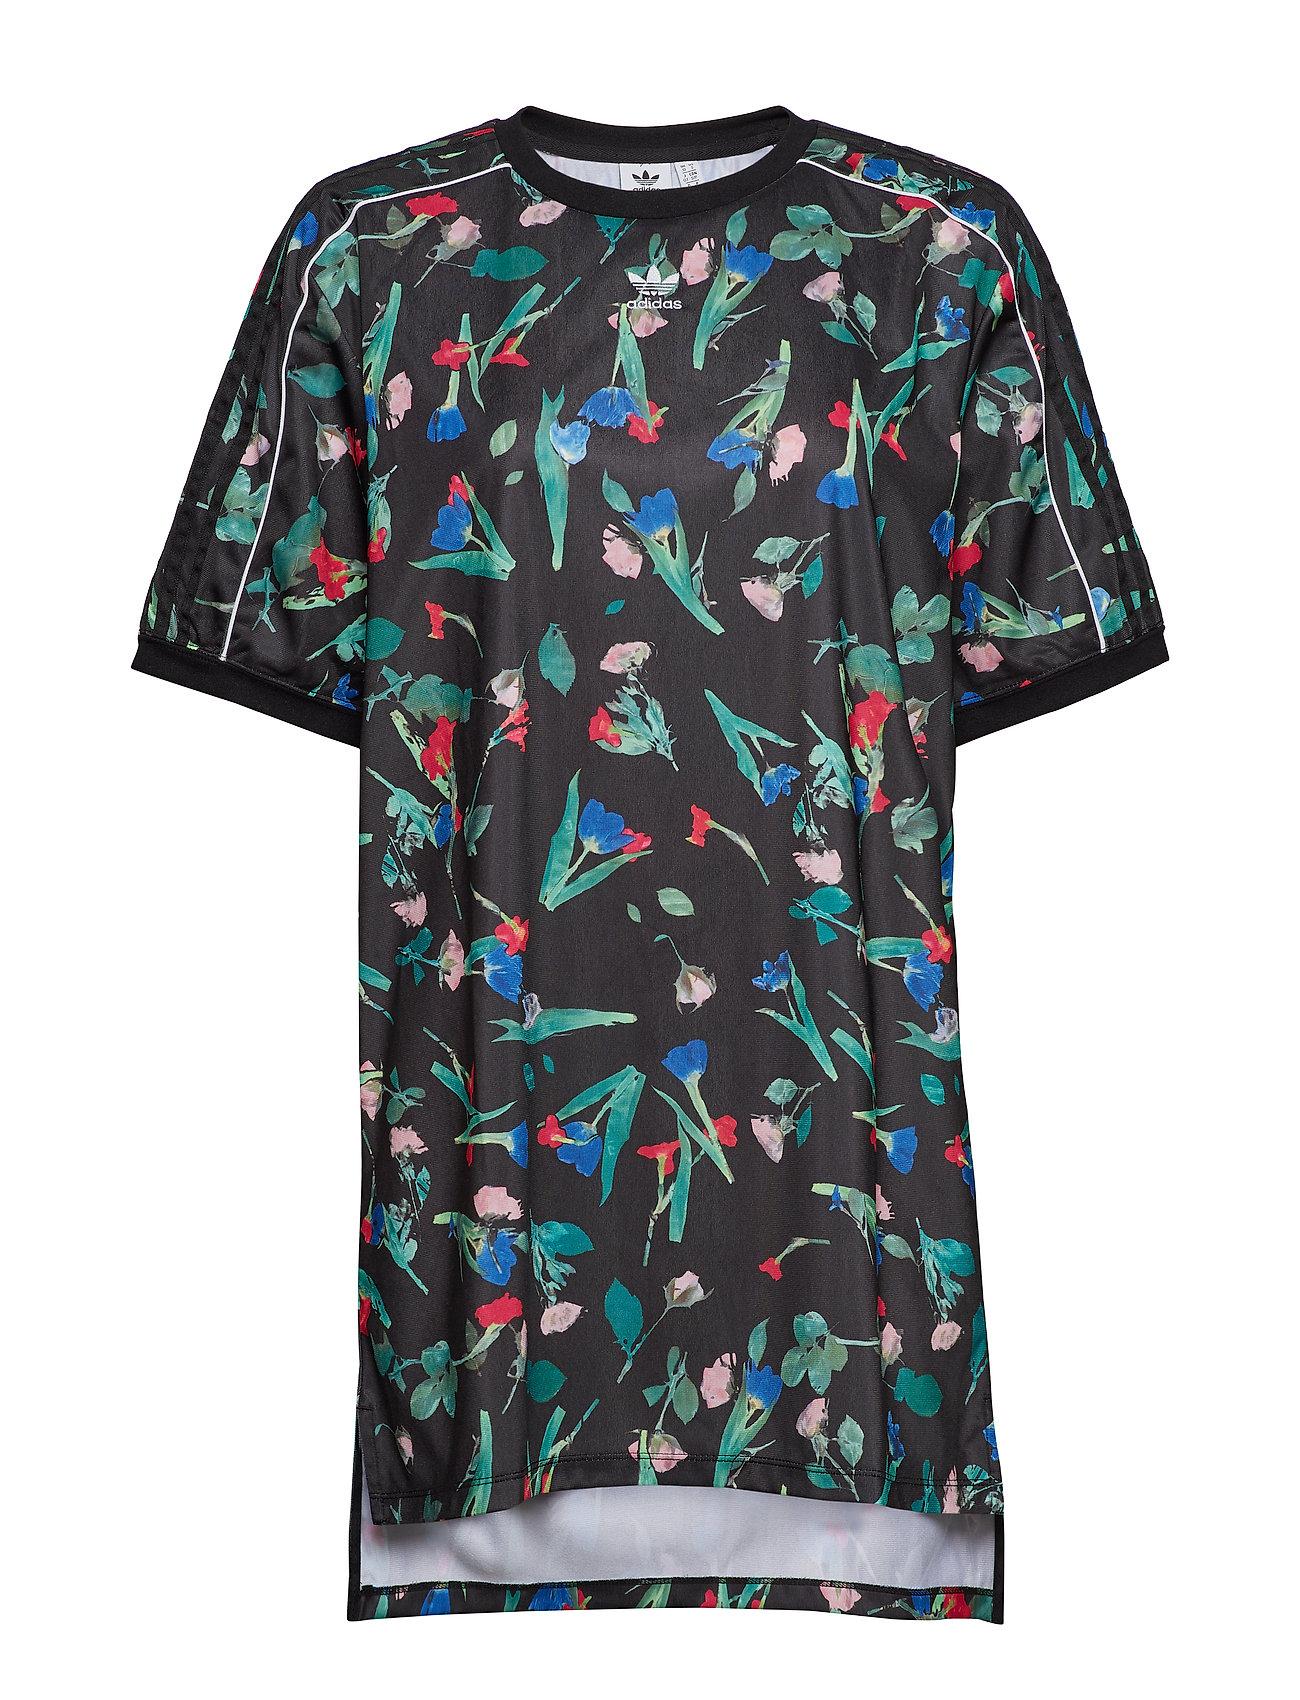 adidas Originals TEE DRESS - MULTCO